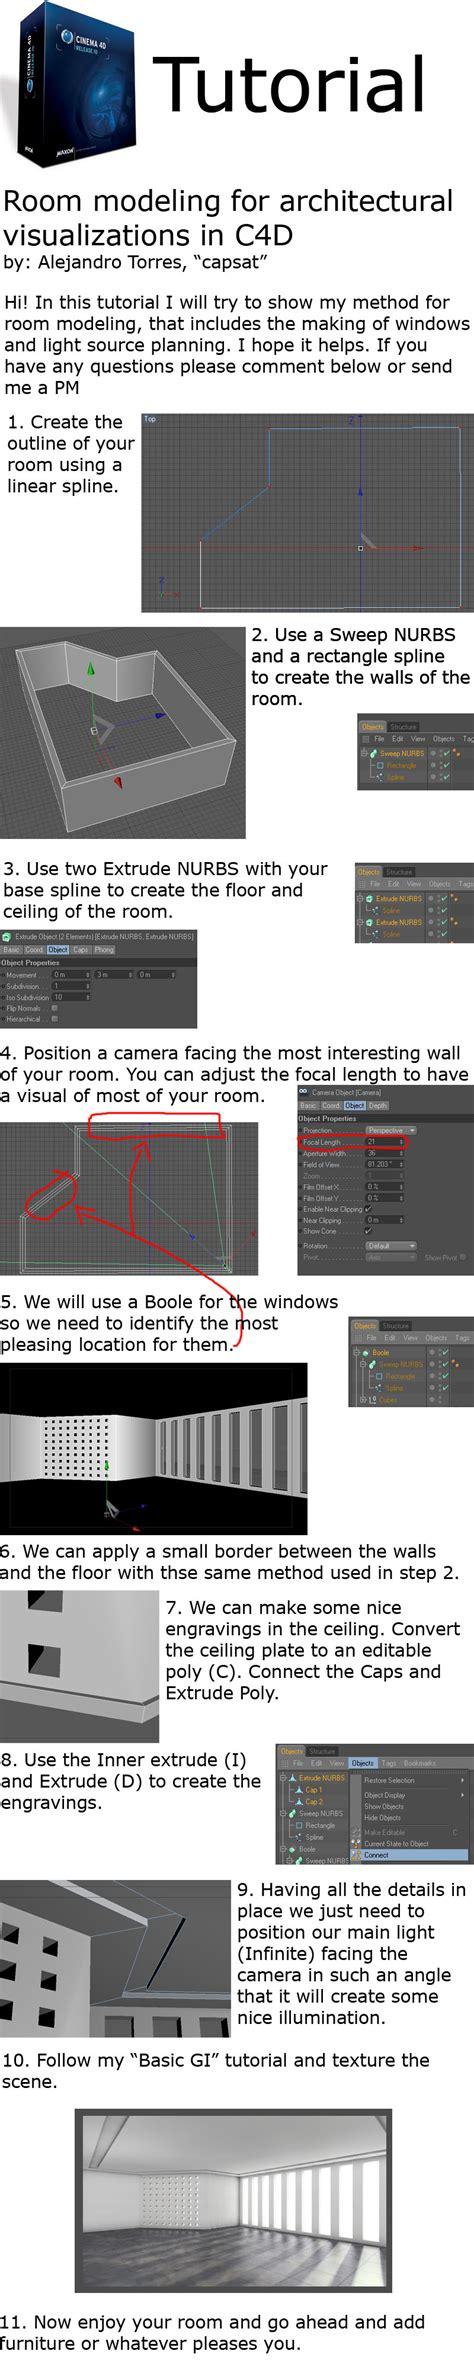 room modeling room modeling c4d tutorial r10 by capsat on deviantart